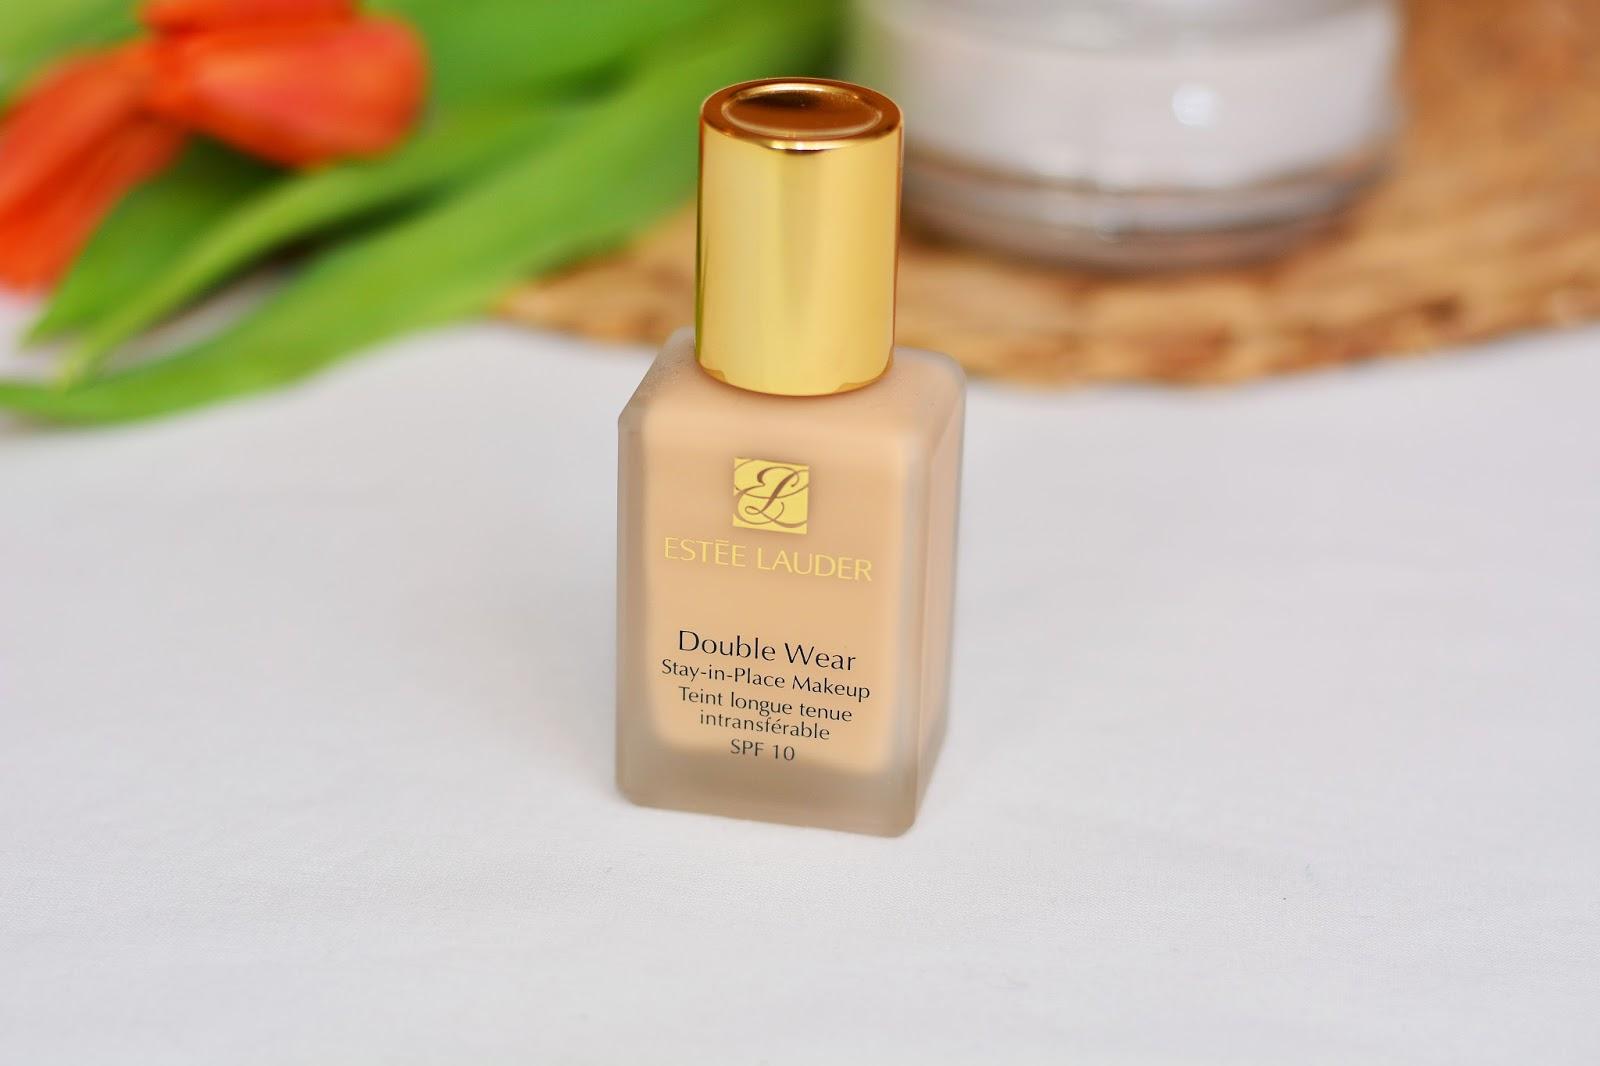 trwały podkład Estee Lauder  Double Wear desert beige